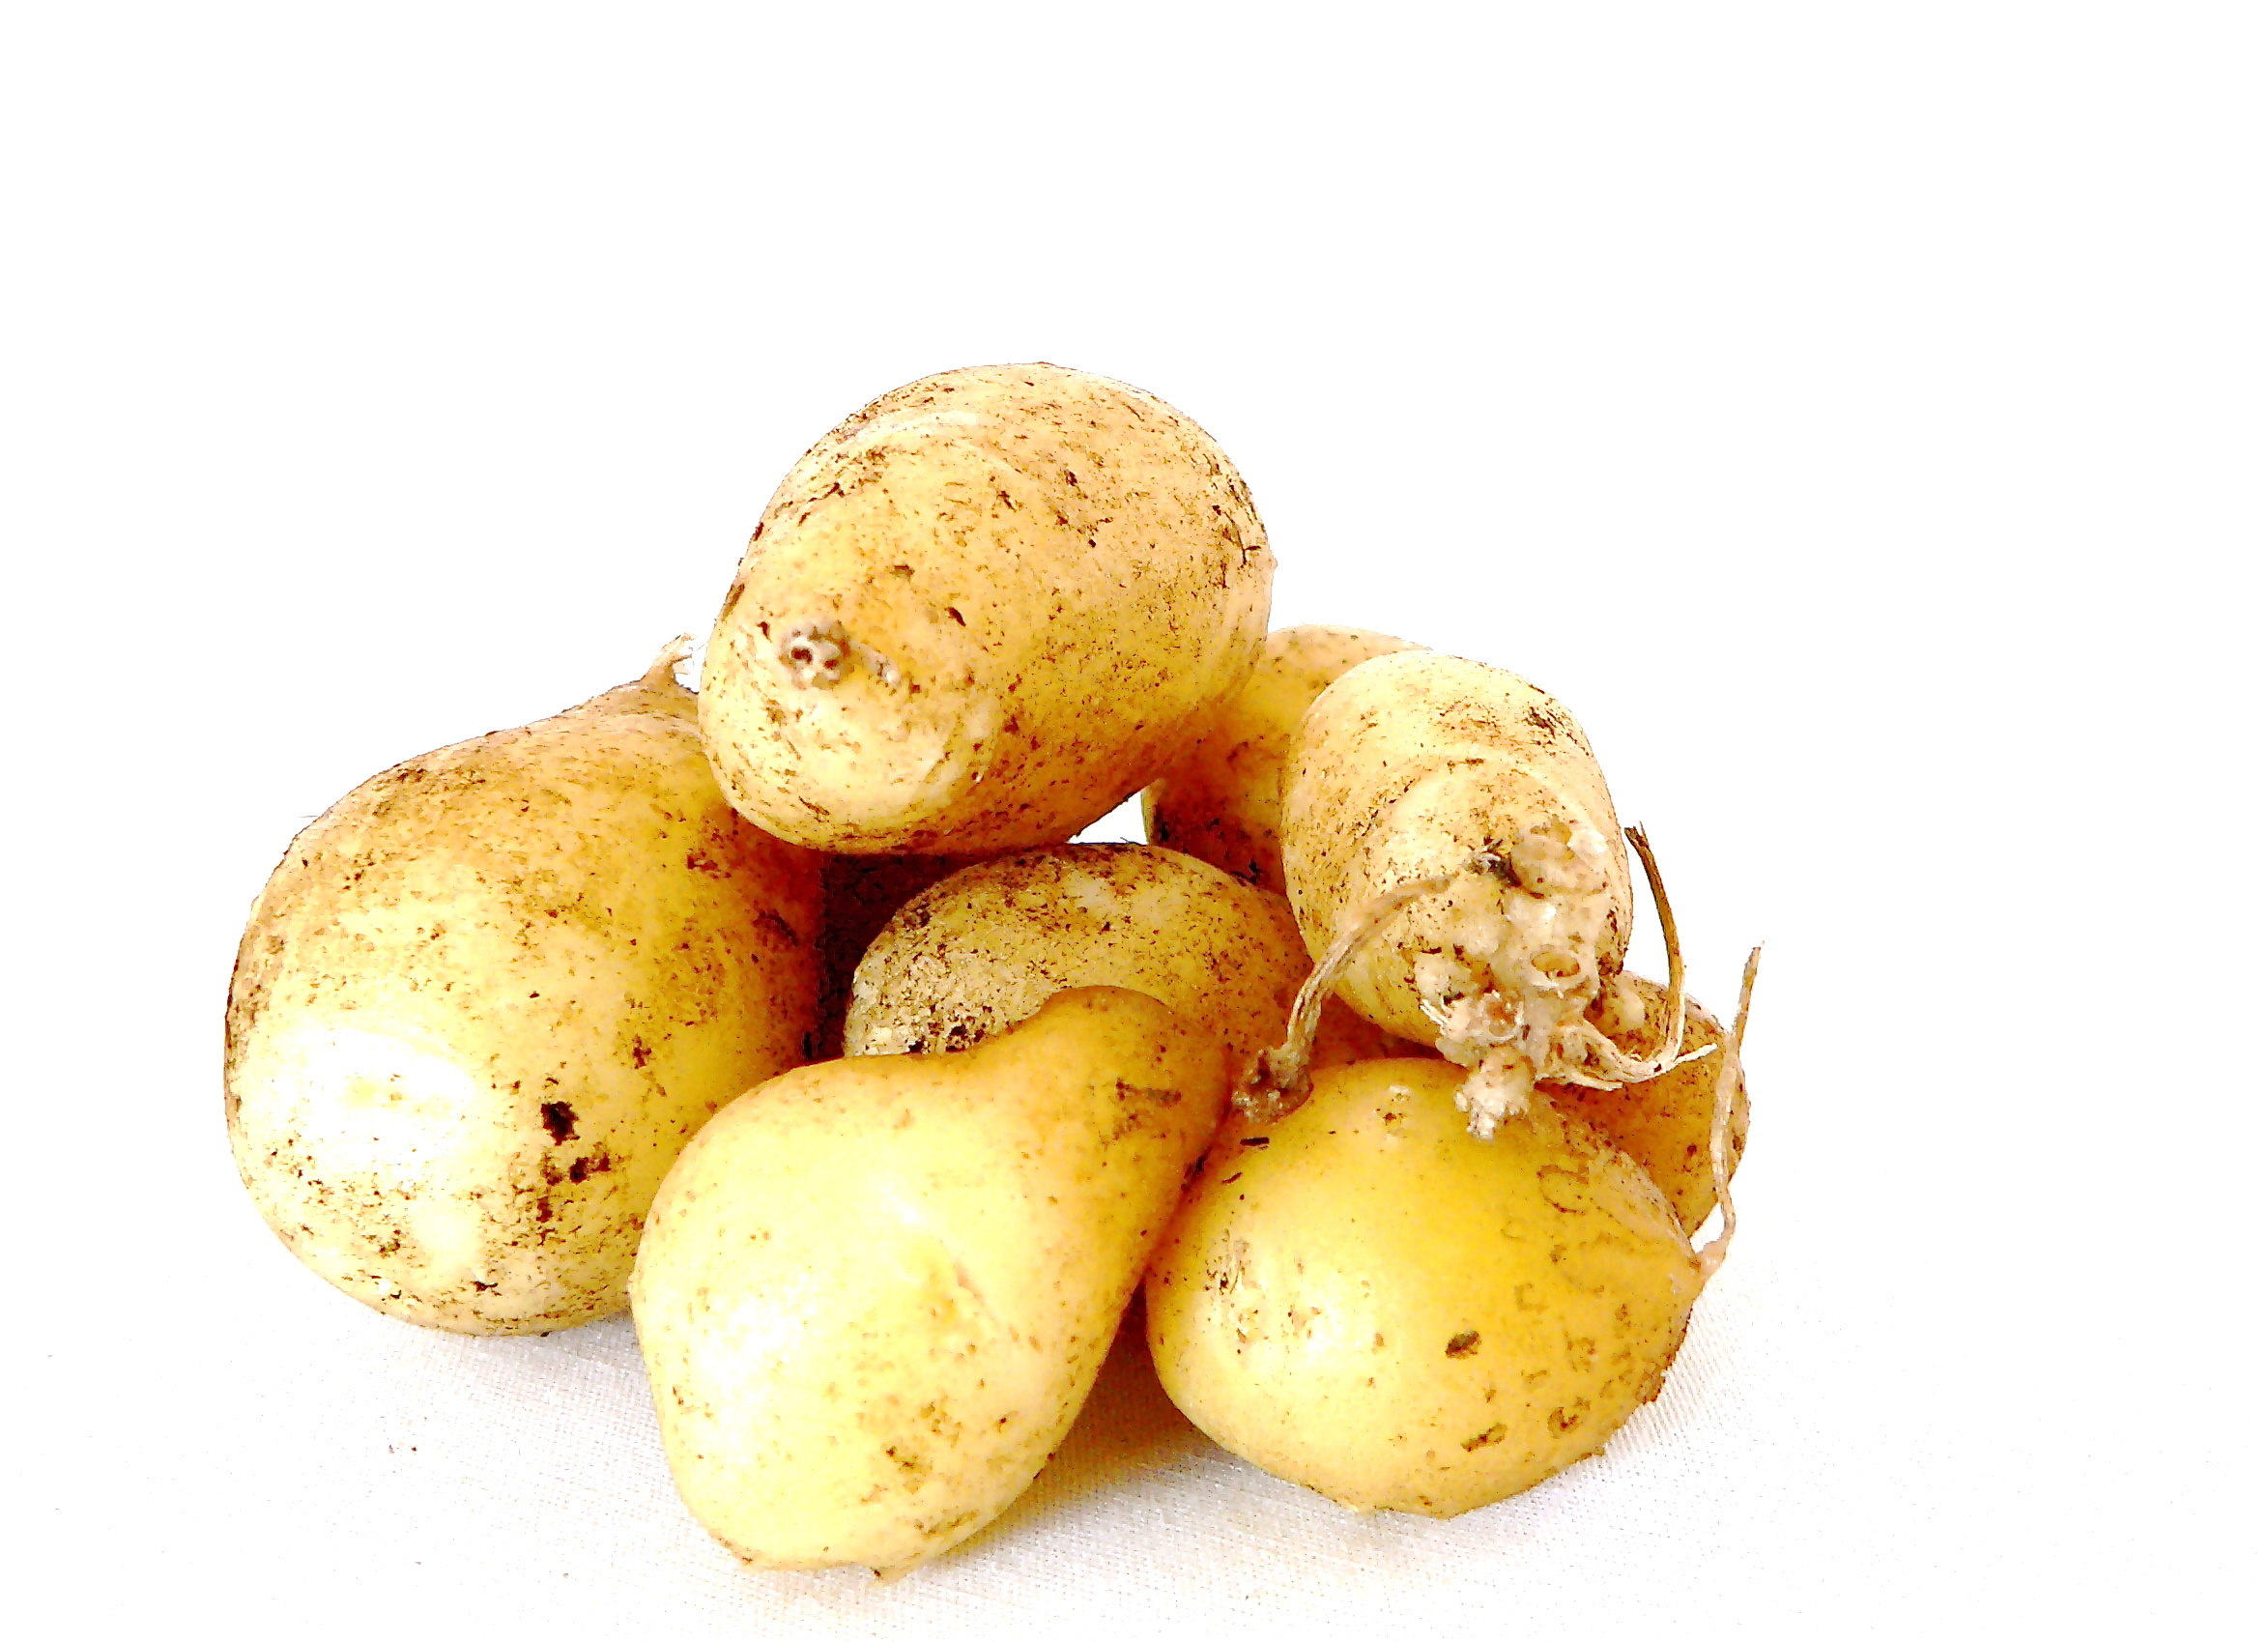 kartoffelfechten › jugendleiterblog